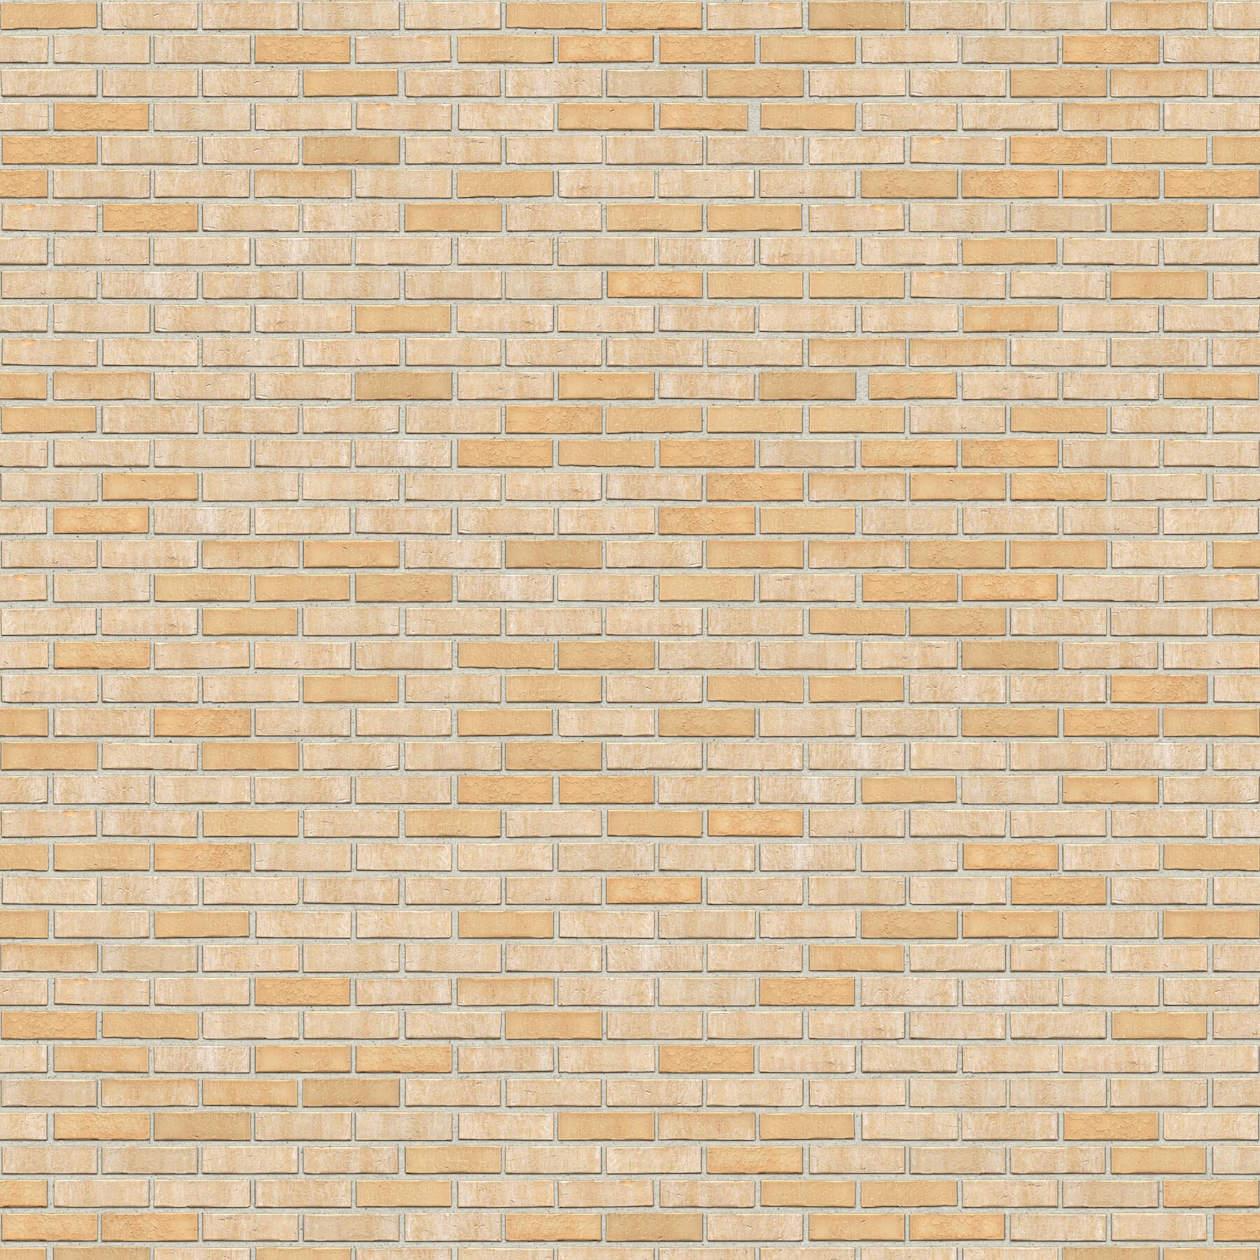 Puna-cigla-FeldHaus-Klinker-brick-house-nf-k-741-Bela Fuga